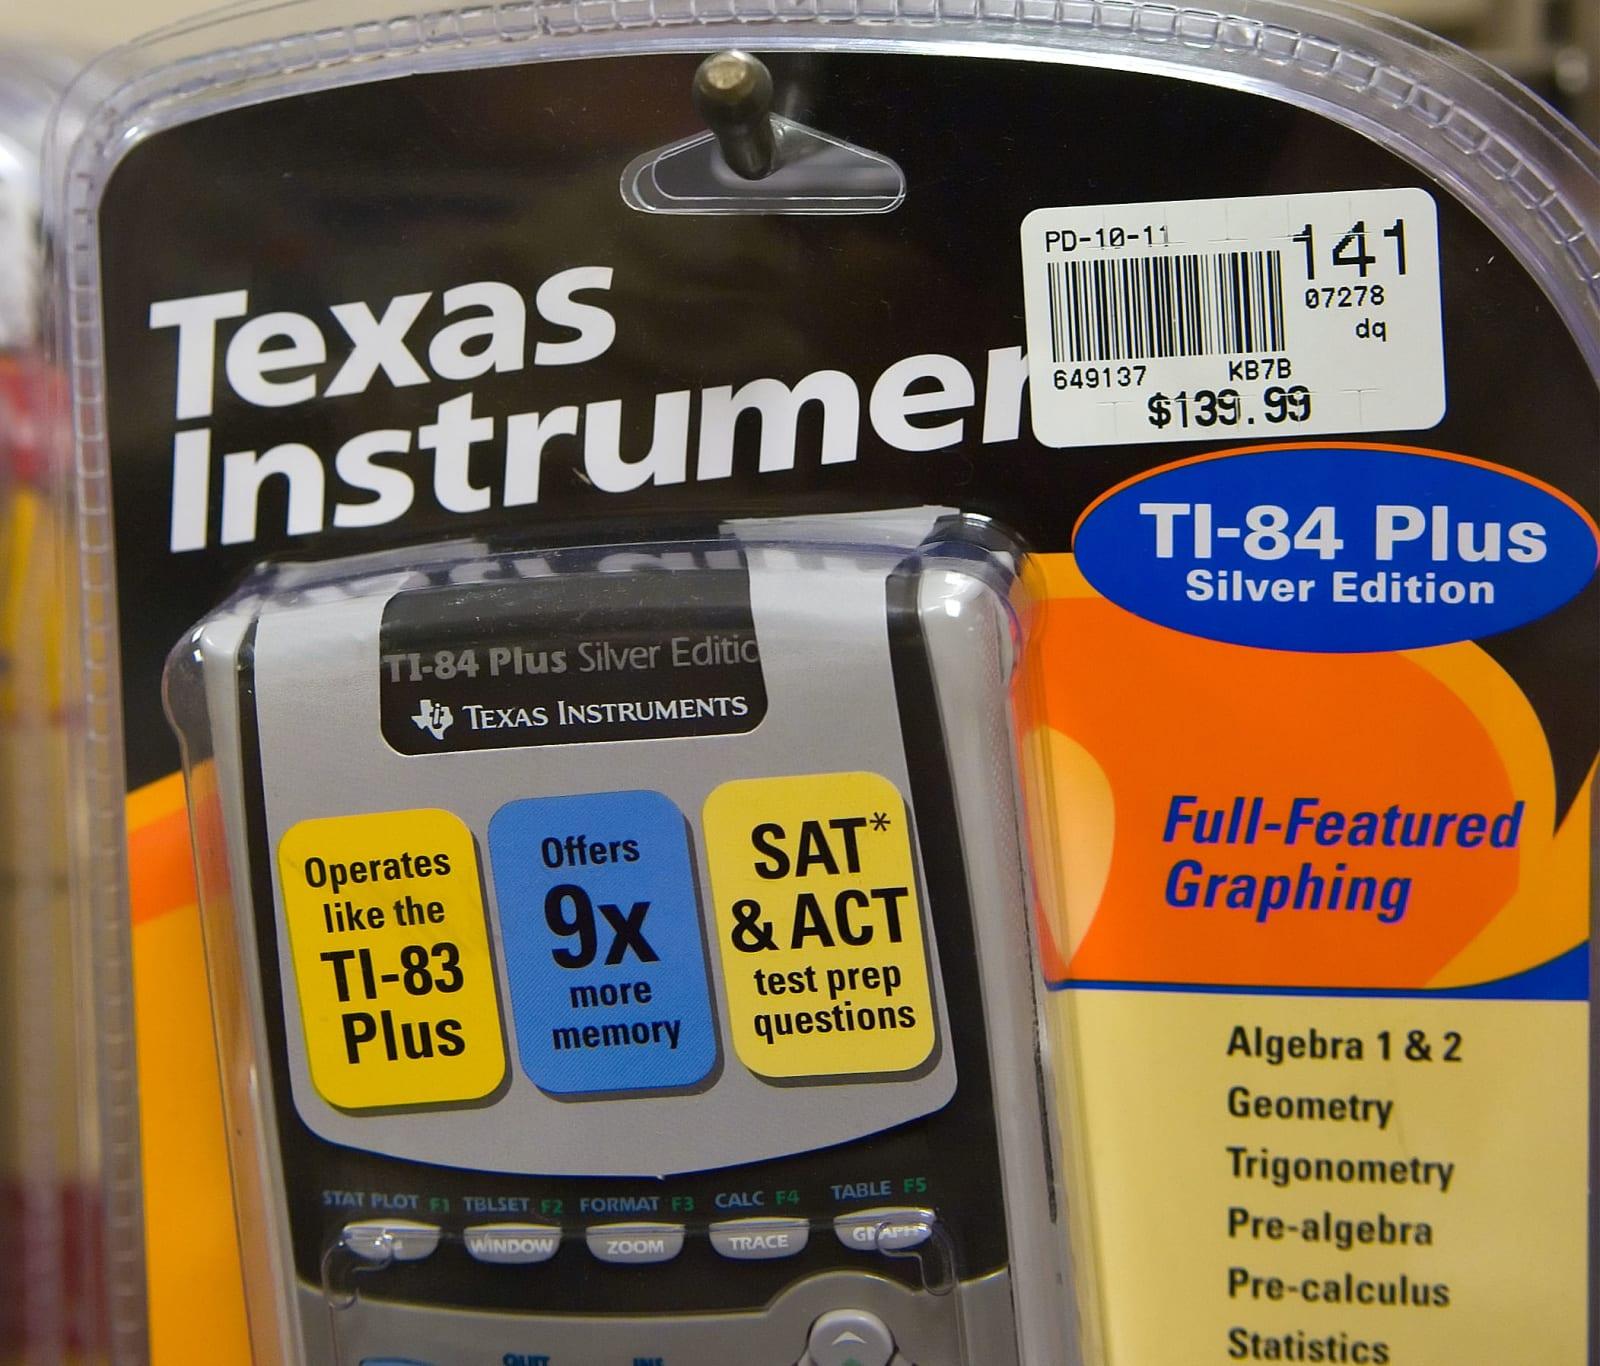 A Texas Instruments TI-84 calculator hangs on a display rack